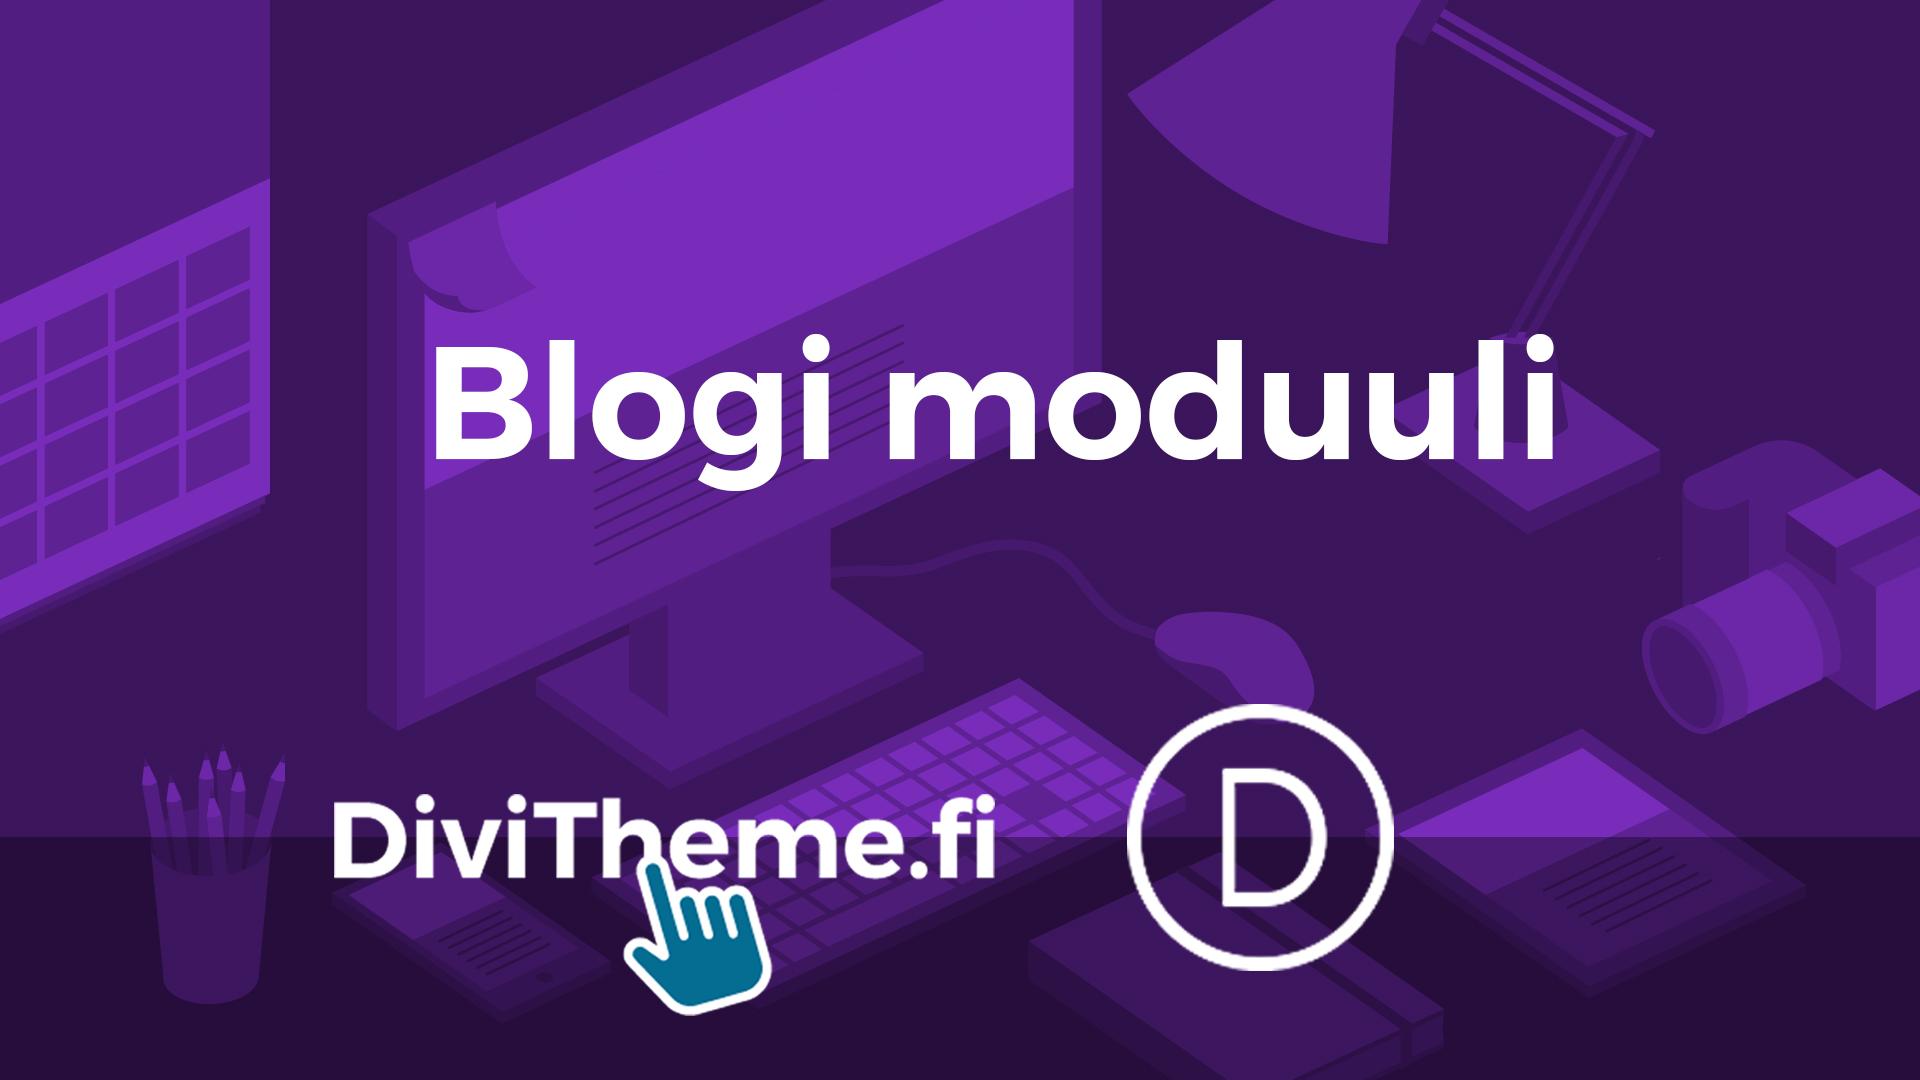 Blogi moduuli